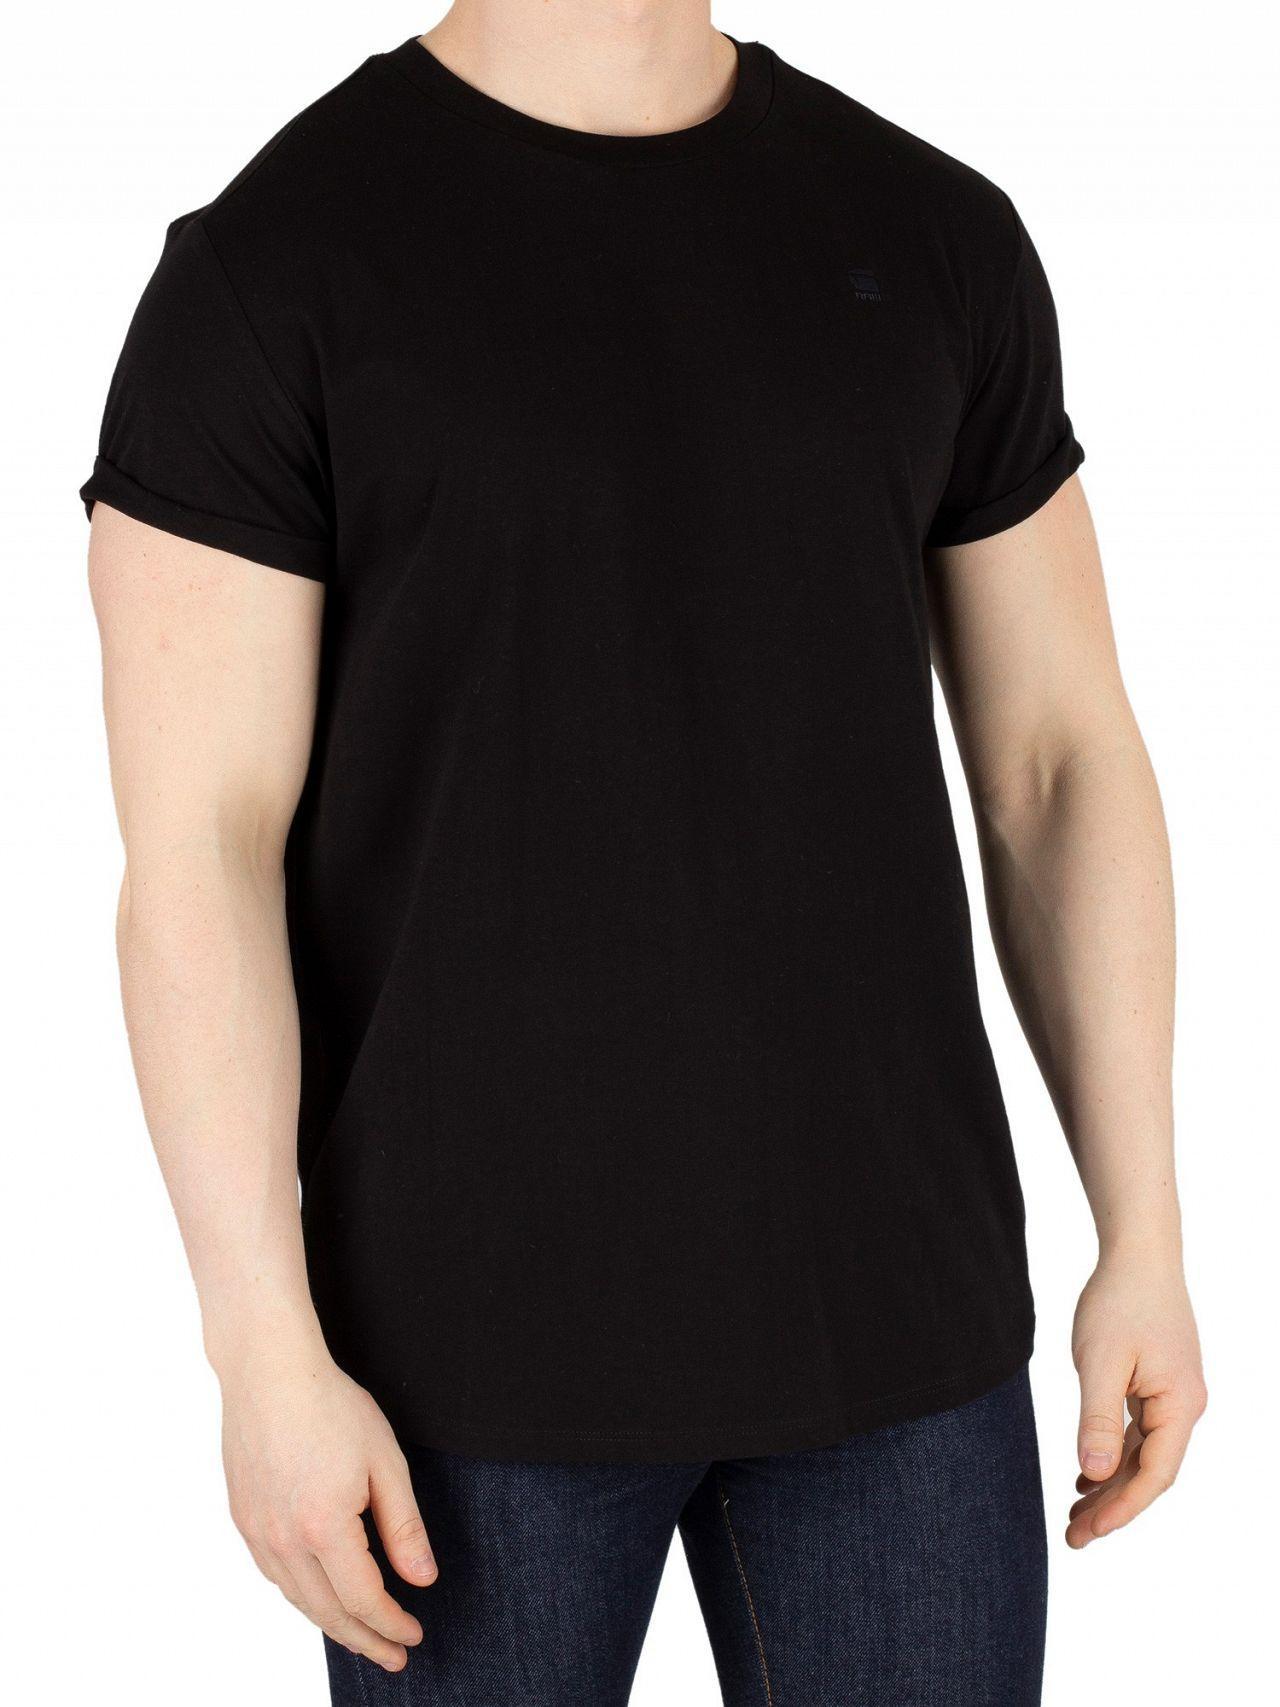 d3987fb95c1 Lyst - G-Star RAW Dark Black Shelo Relaxed Fit T-shirt in Black for Men